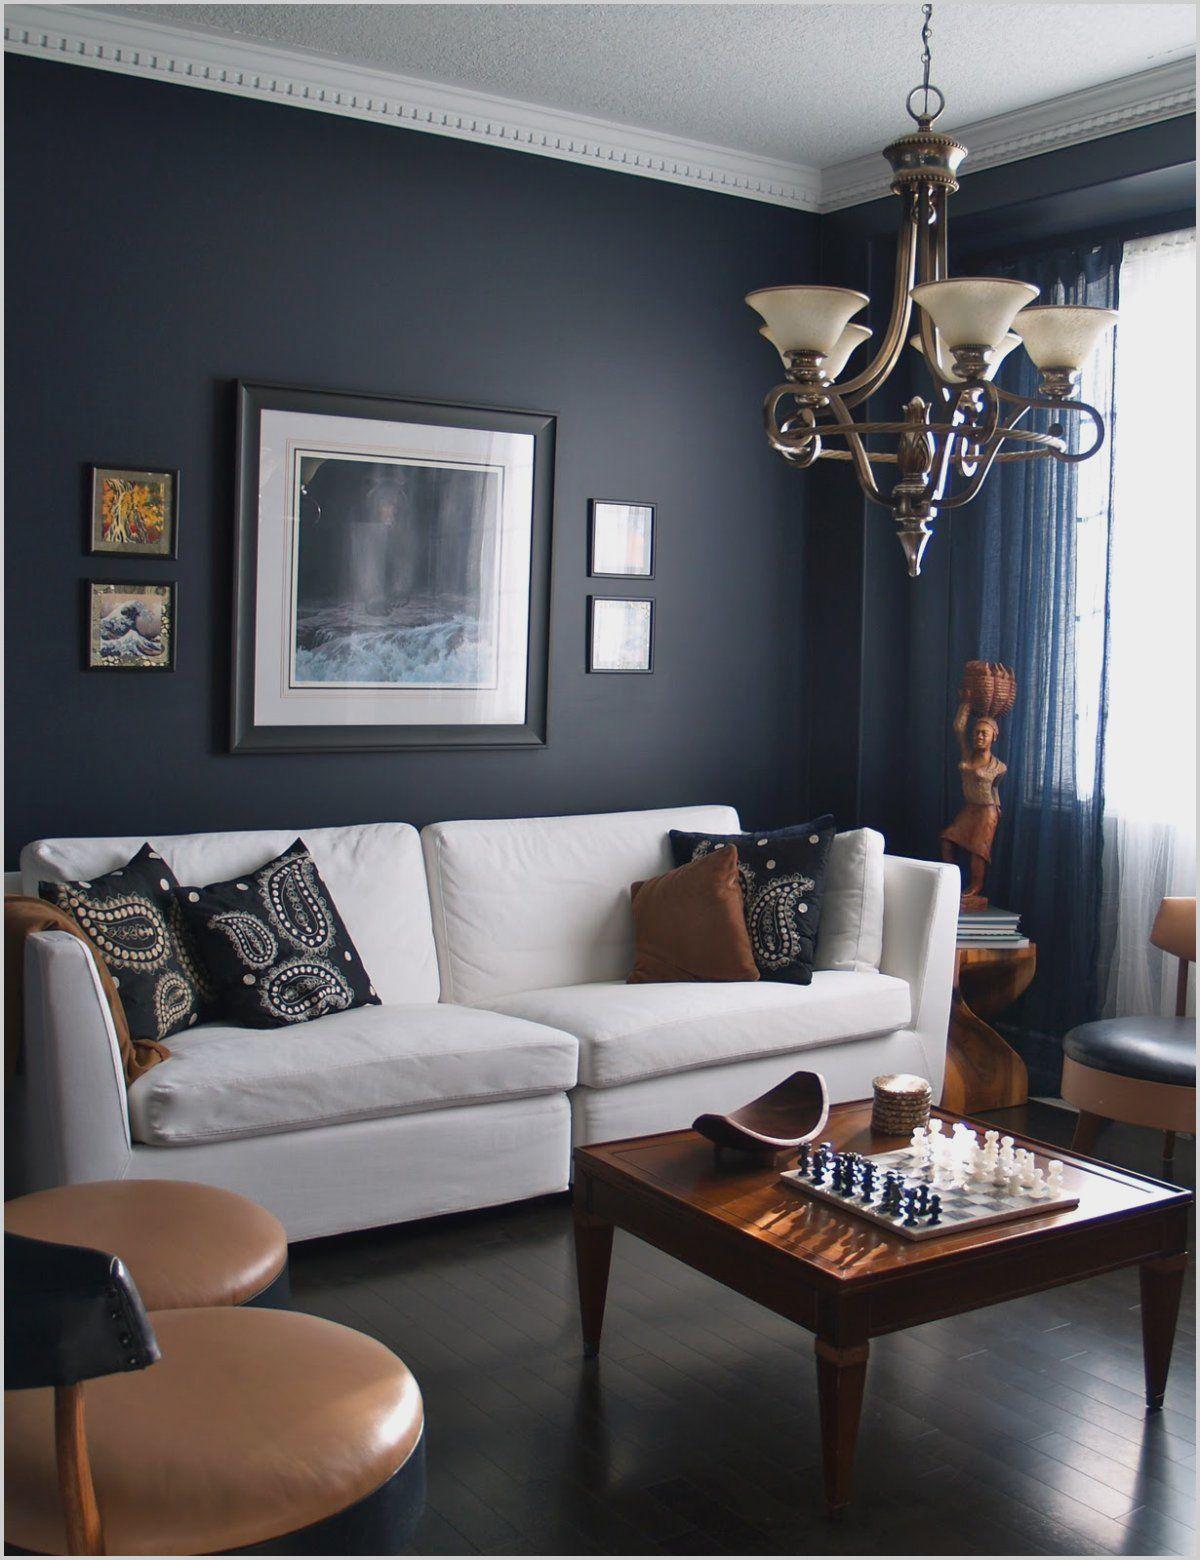 Living Room Ideas Blue And Gray Ruang Tamu Modern Desain Kamar Set Ruang Keluarga Blue living room decor